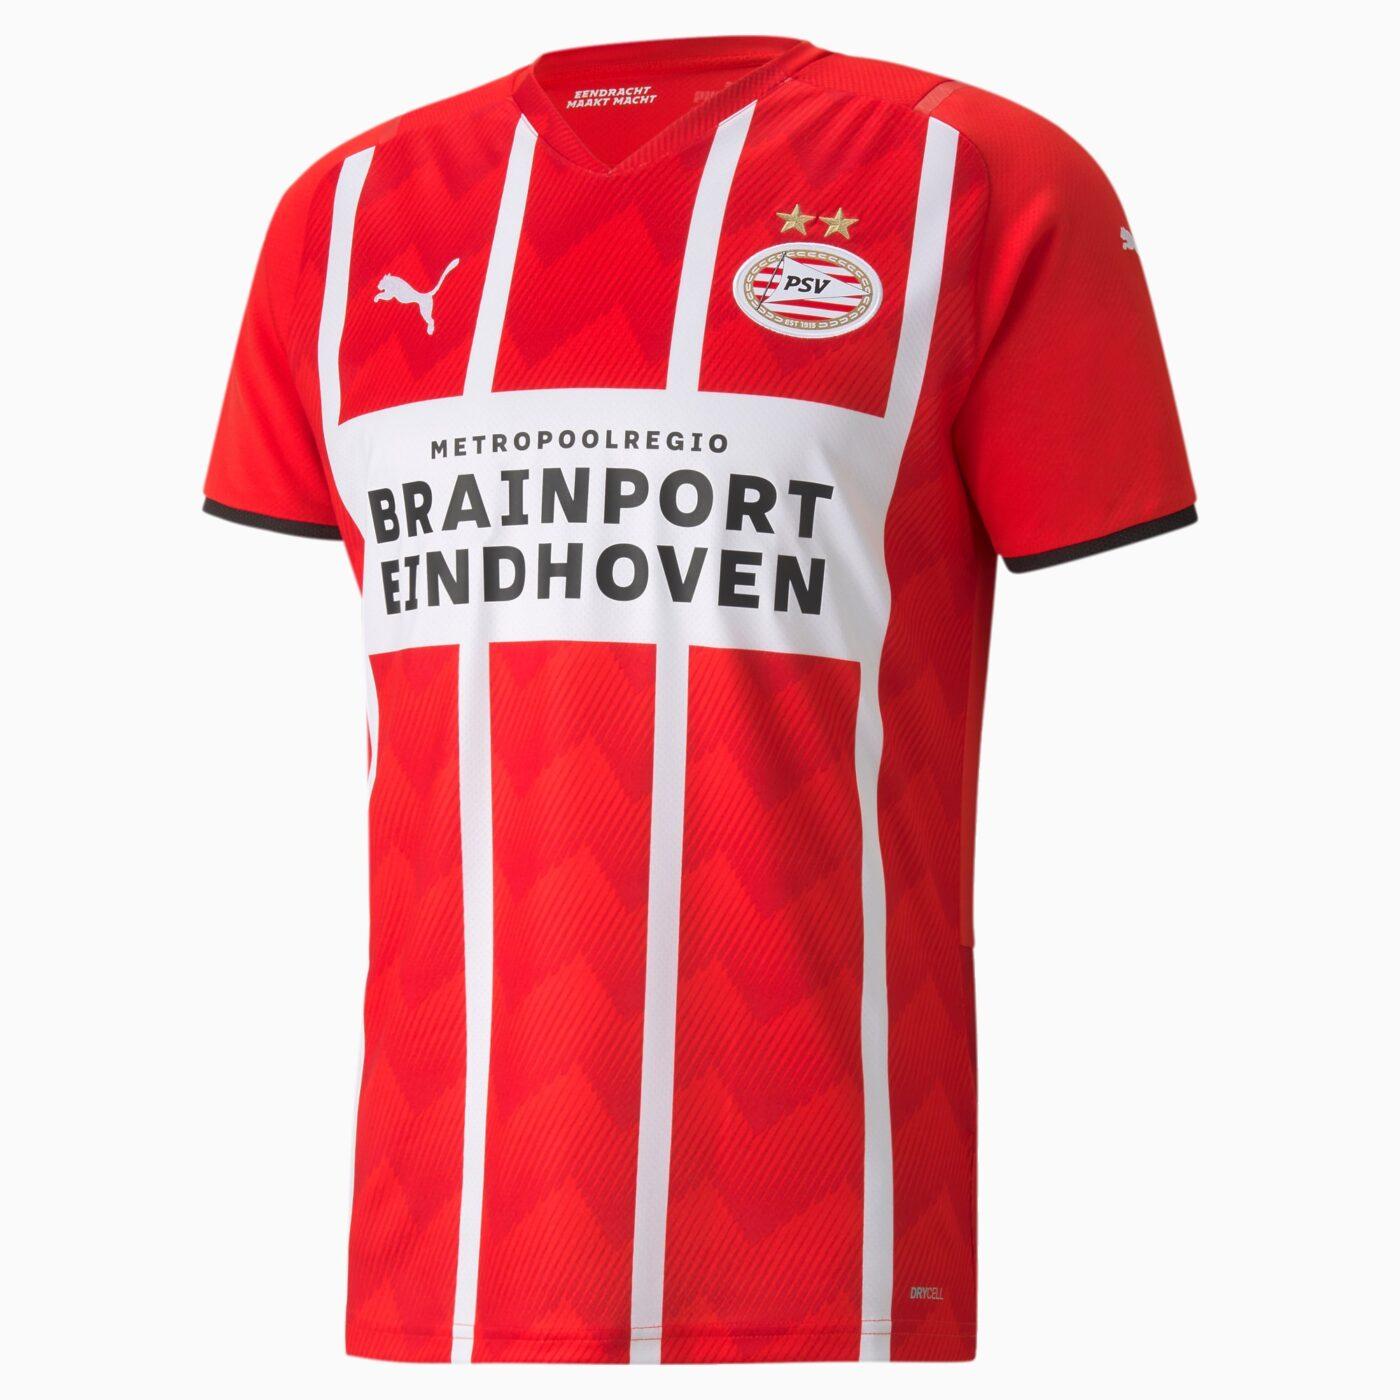 Maillot PSV Eindhoven 2021-2022 domicile